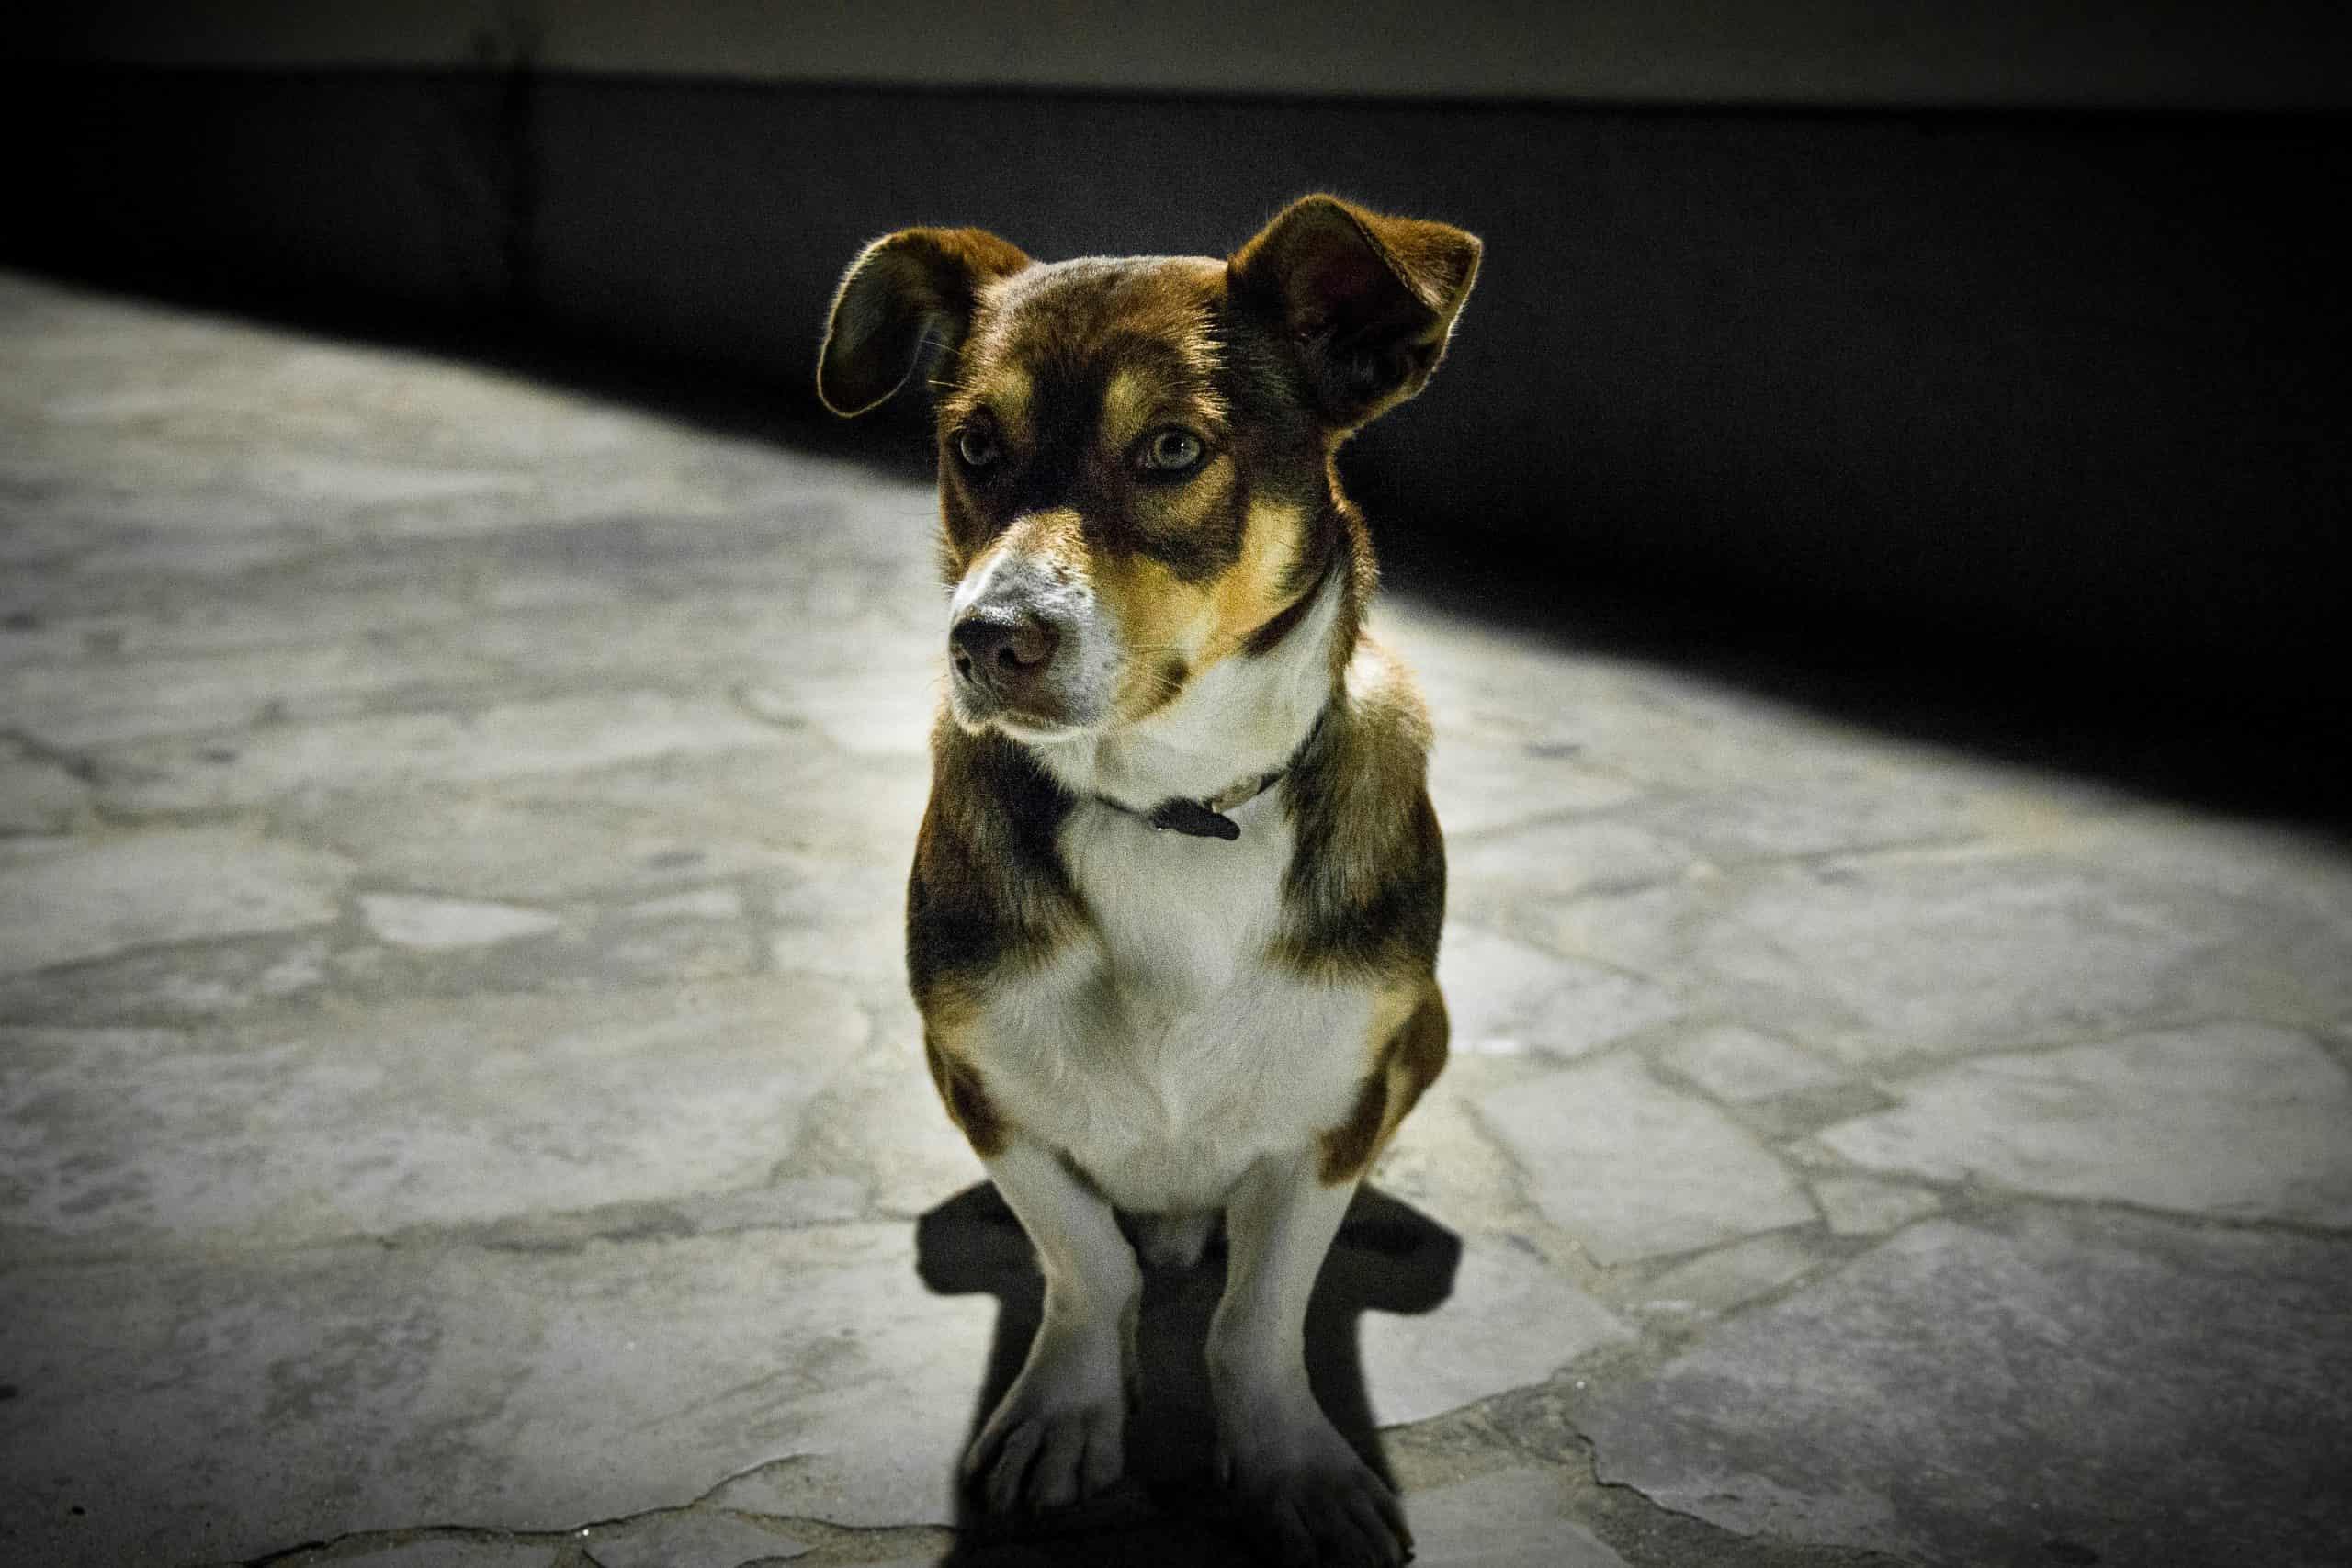 dogs sense ghosts